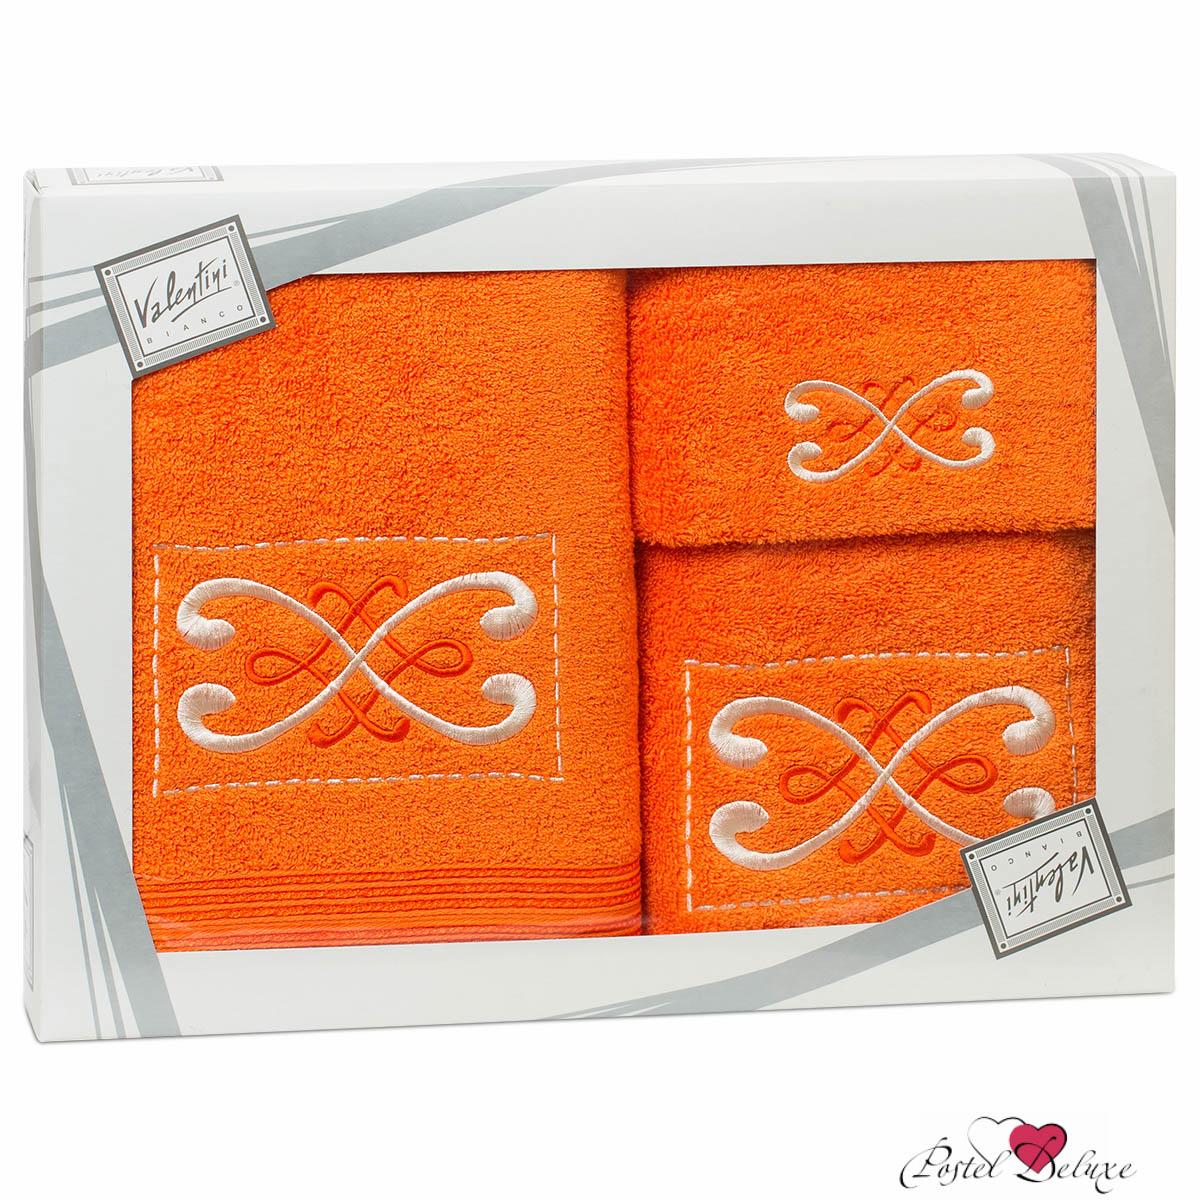 Полотенца Valentini Полотенце Fantasy Цвет: Оранжевый (Набор) набор из 3 полотенец merzuka sakura 50х90 2 70х140 8432 оранжевый